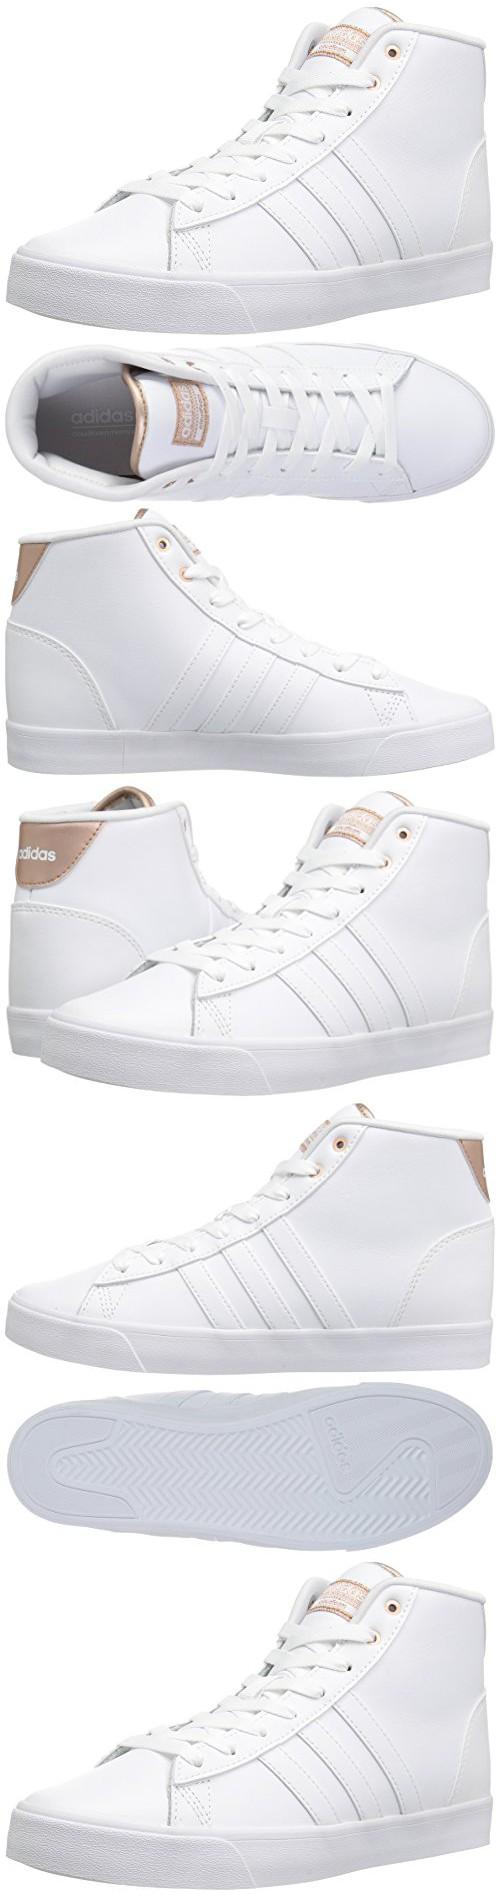 Adidas NEO Women's Cloudfoam Daily Qt Mid W Fashion Sneaker